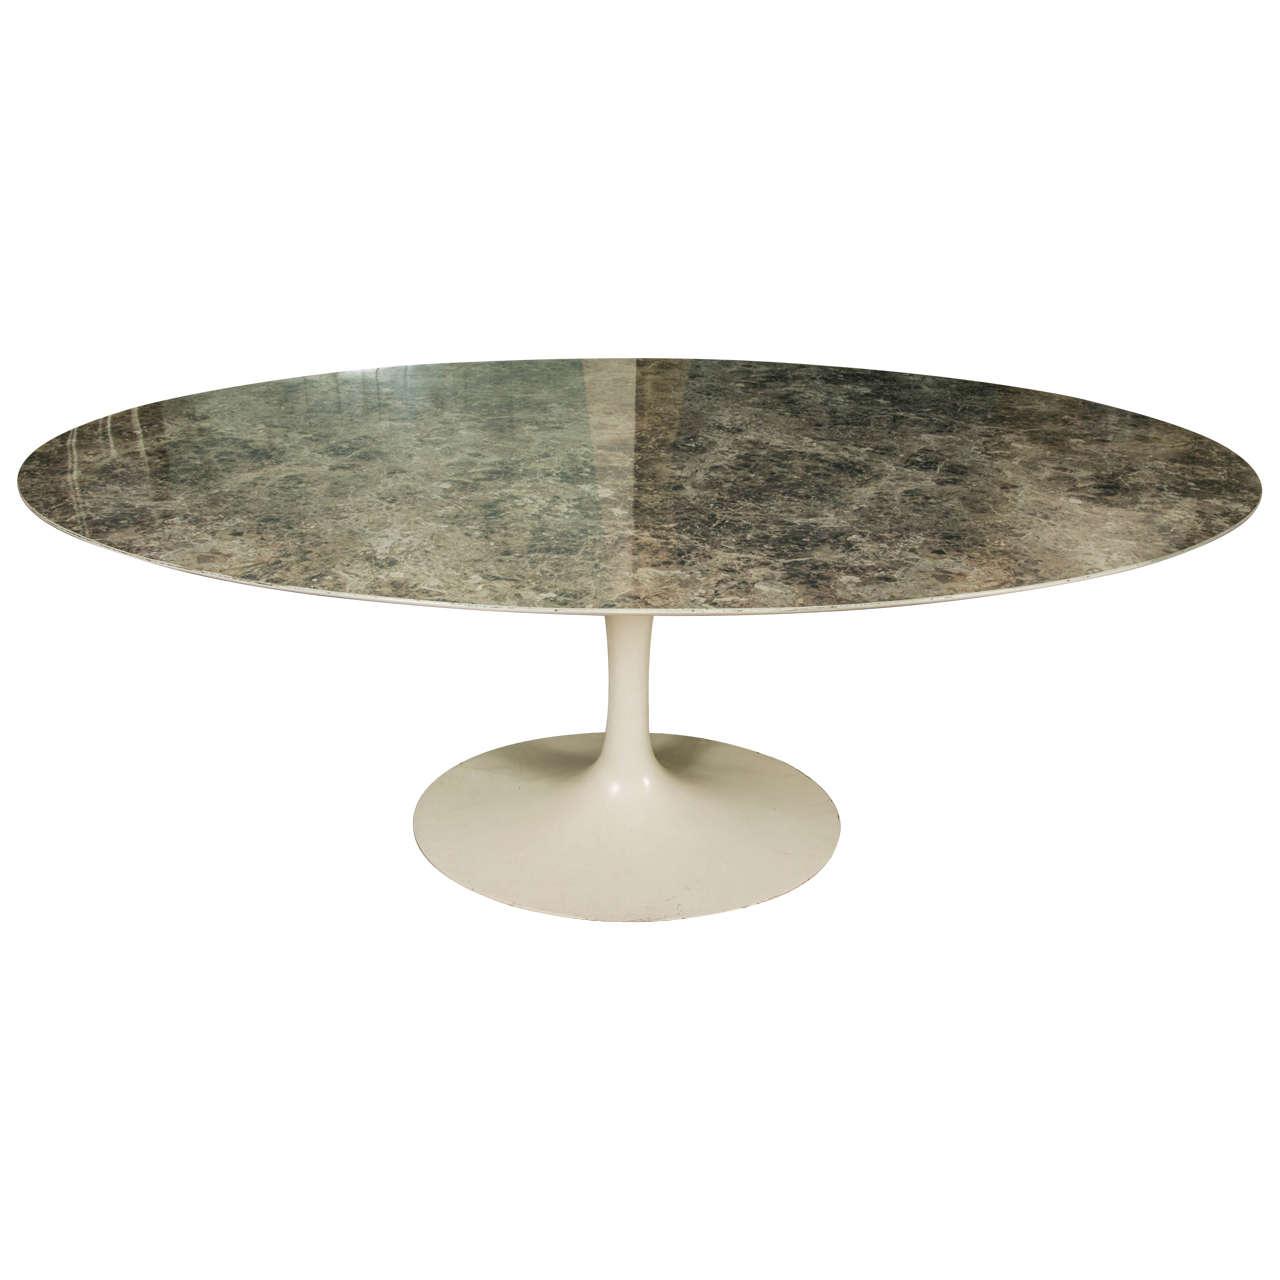 Great Large Oval Tulip Dining Table In Grey Laminate By Eero Saarinen, Circa1960 1